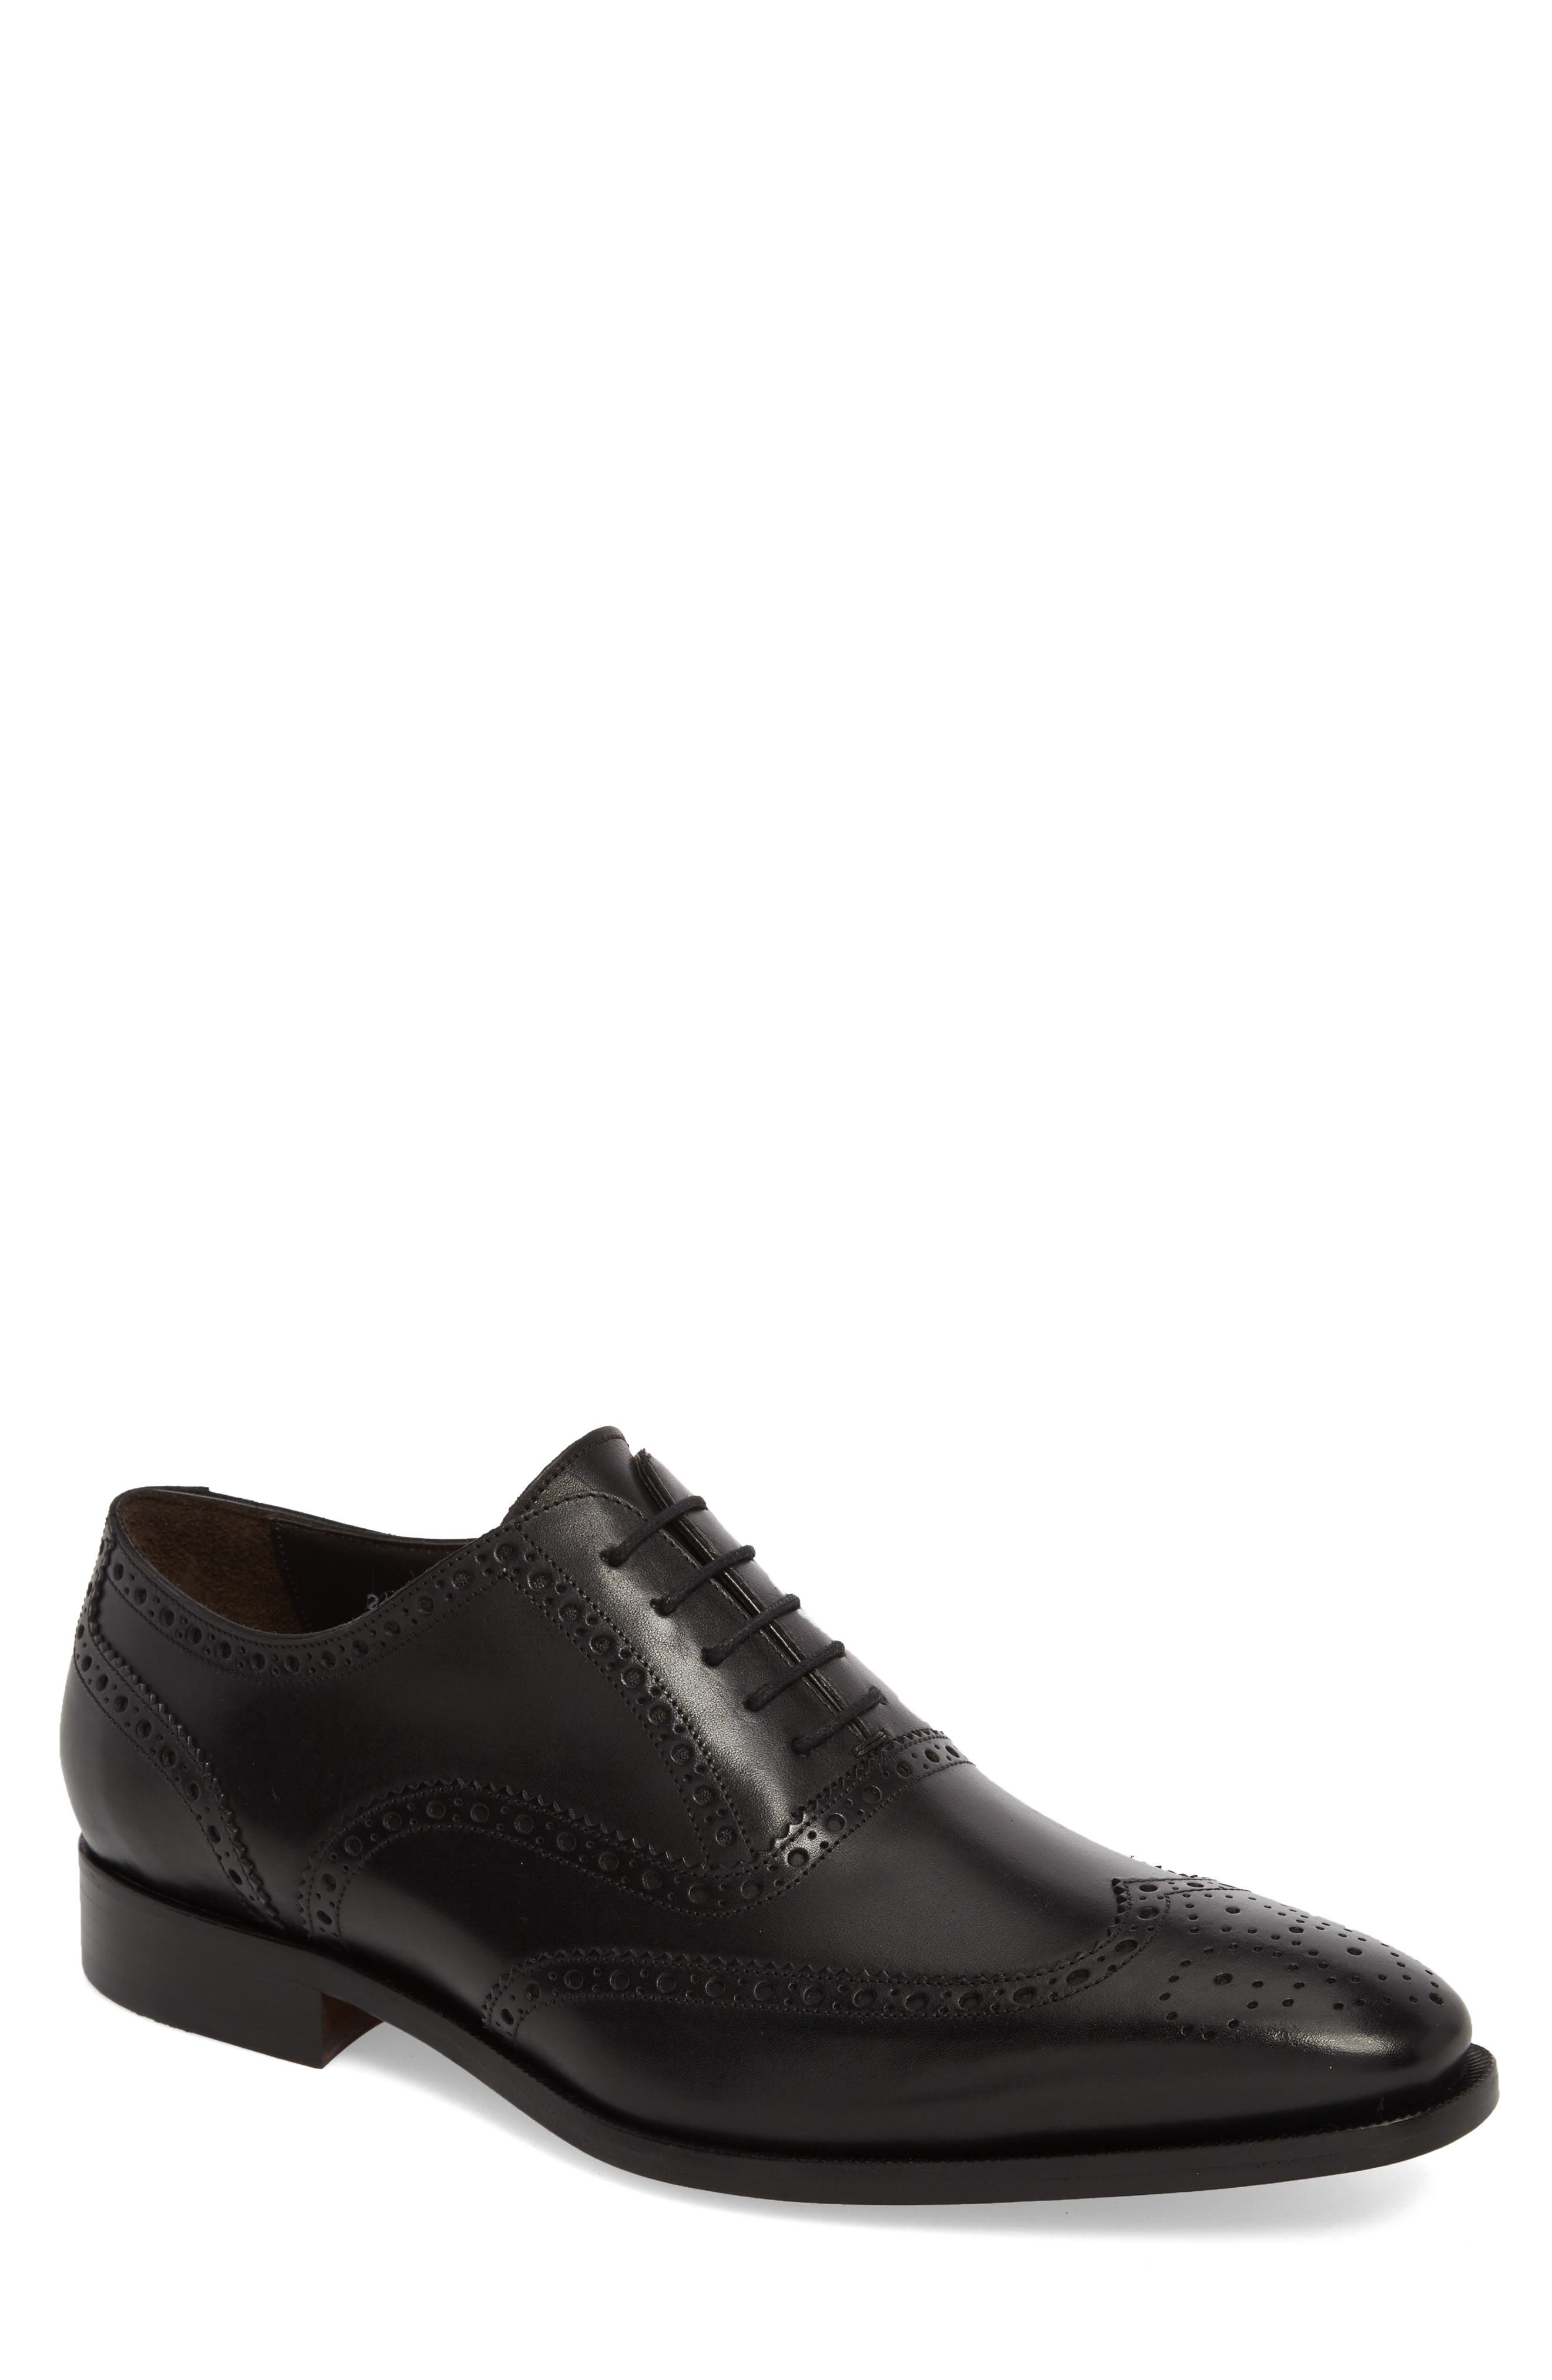 Ambler Leather Wingtip Oxfords in Black Leather